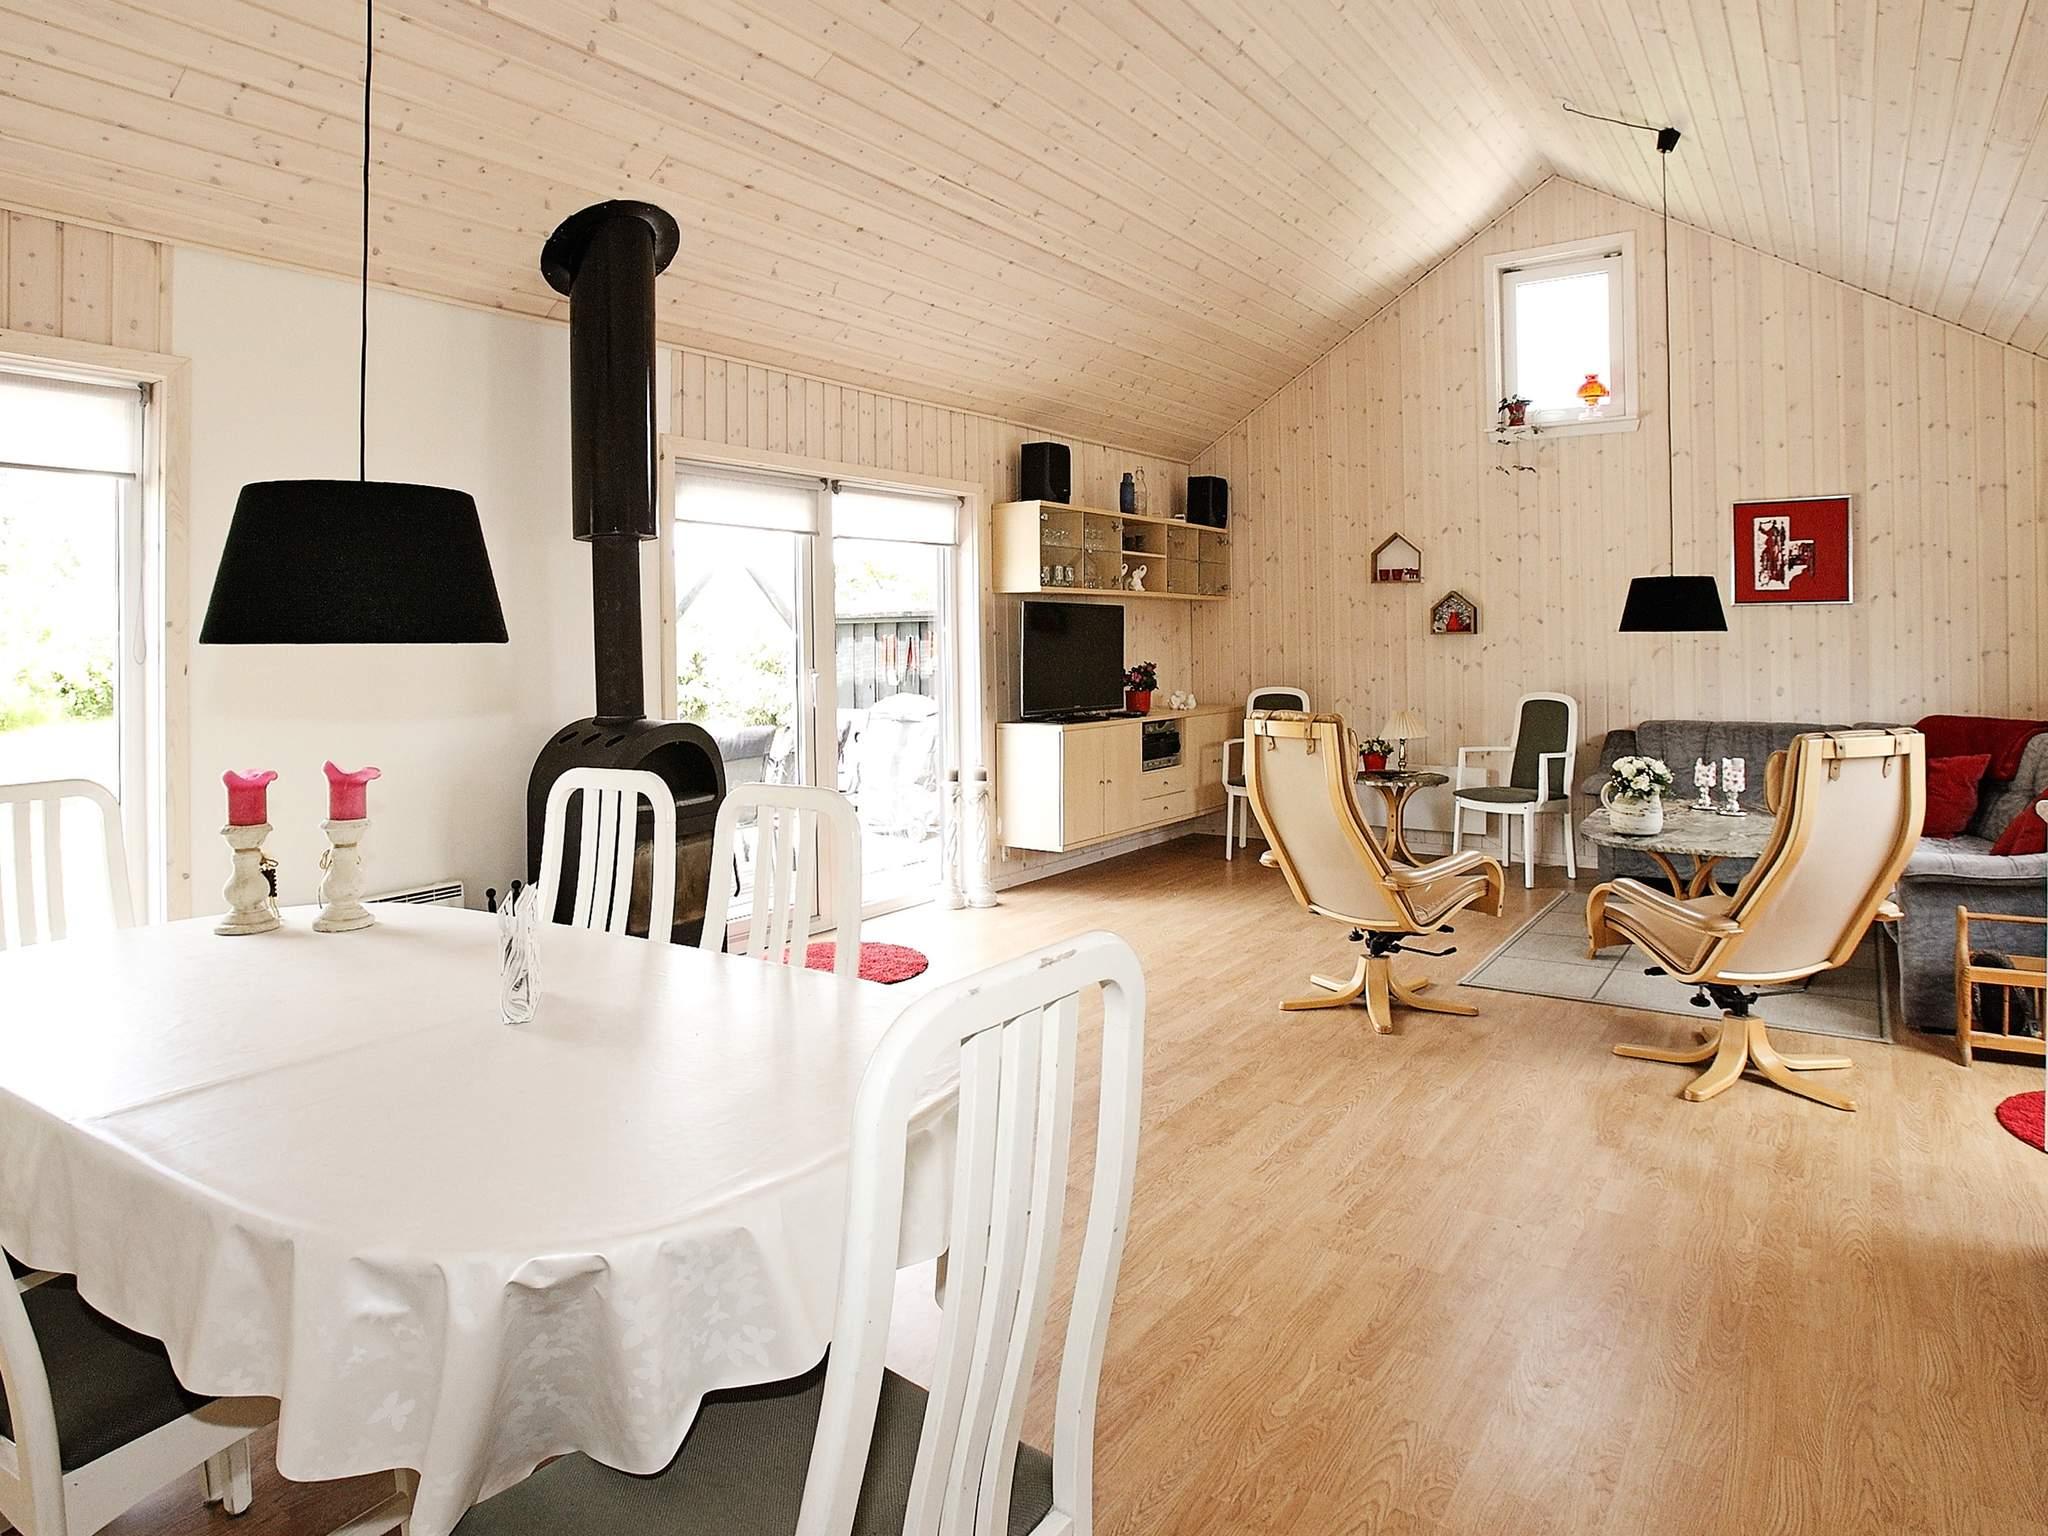 Ferienhaus Øster Hurup (88055), Øster Hurup, , Ostjütland, Dänemark, Bild 6